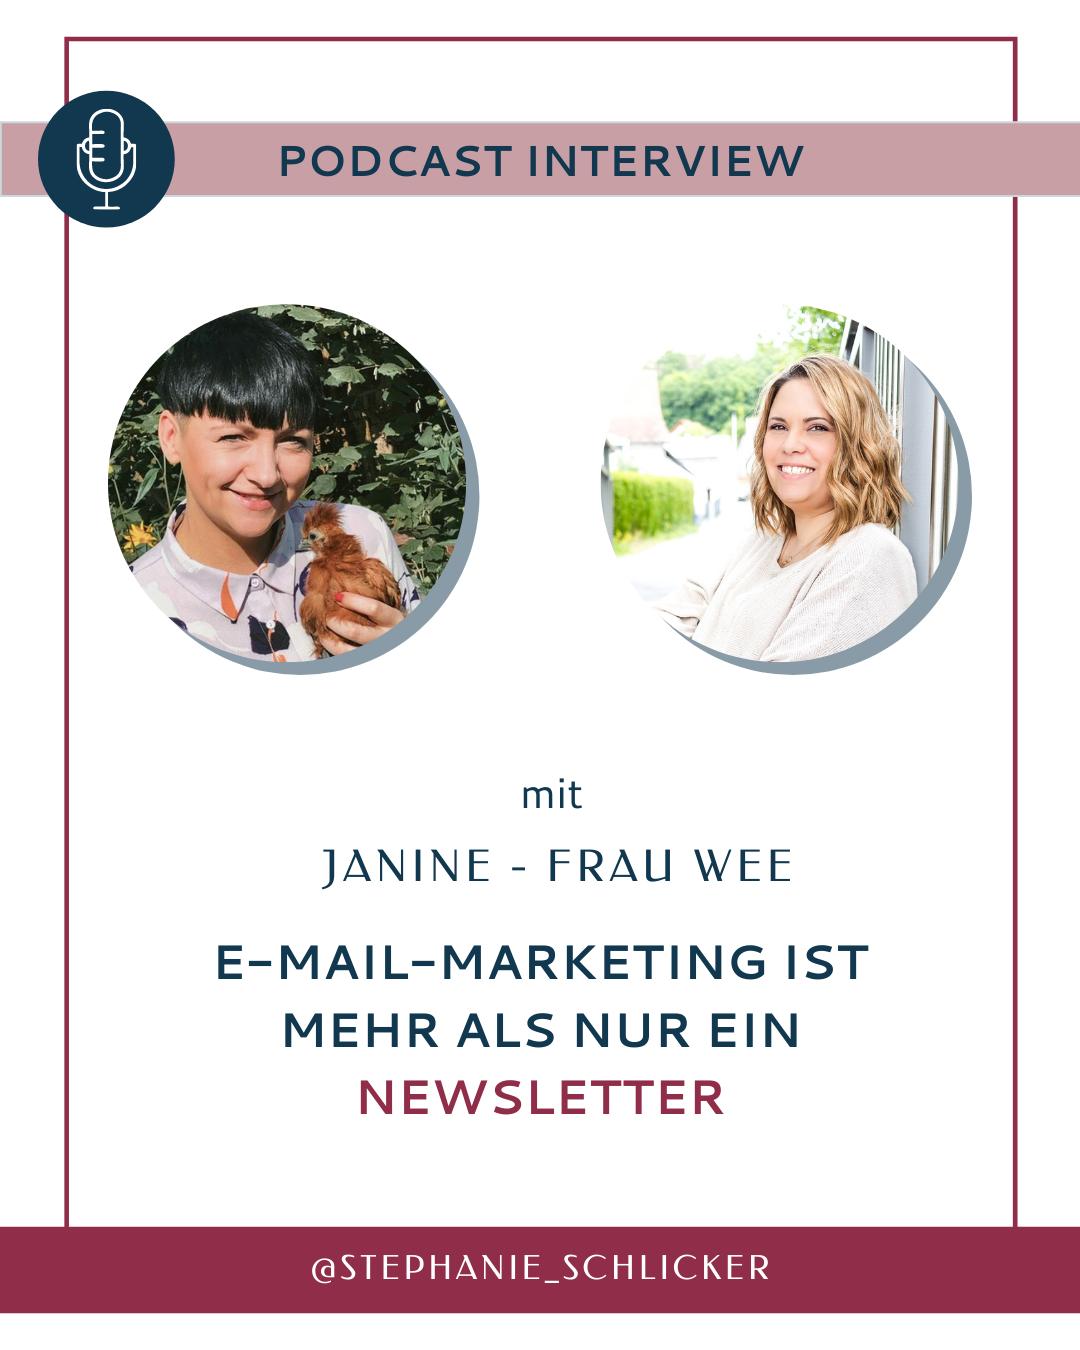 Frau Wee – E-Mail-Marketing ist so viel mehr